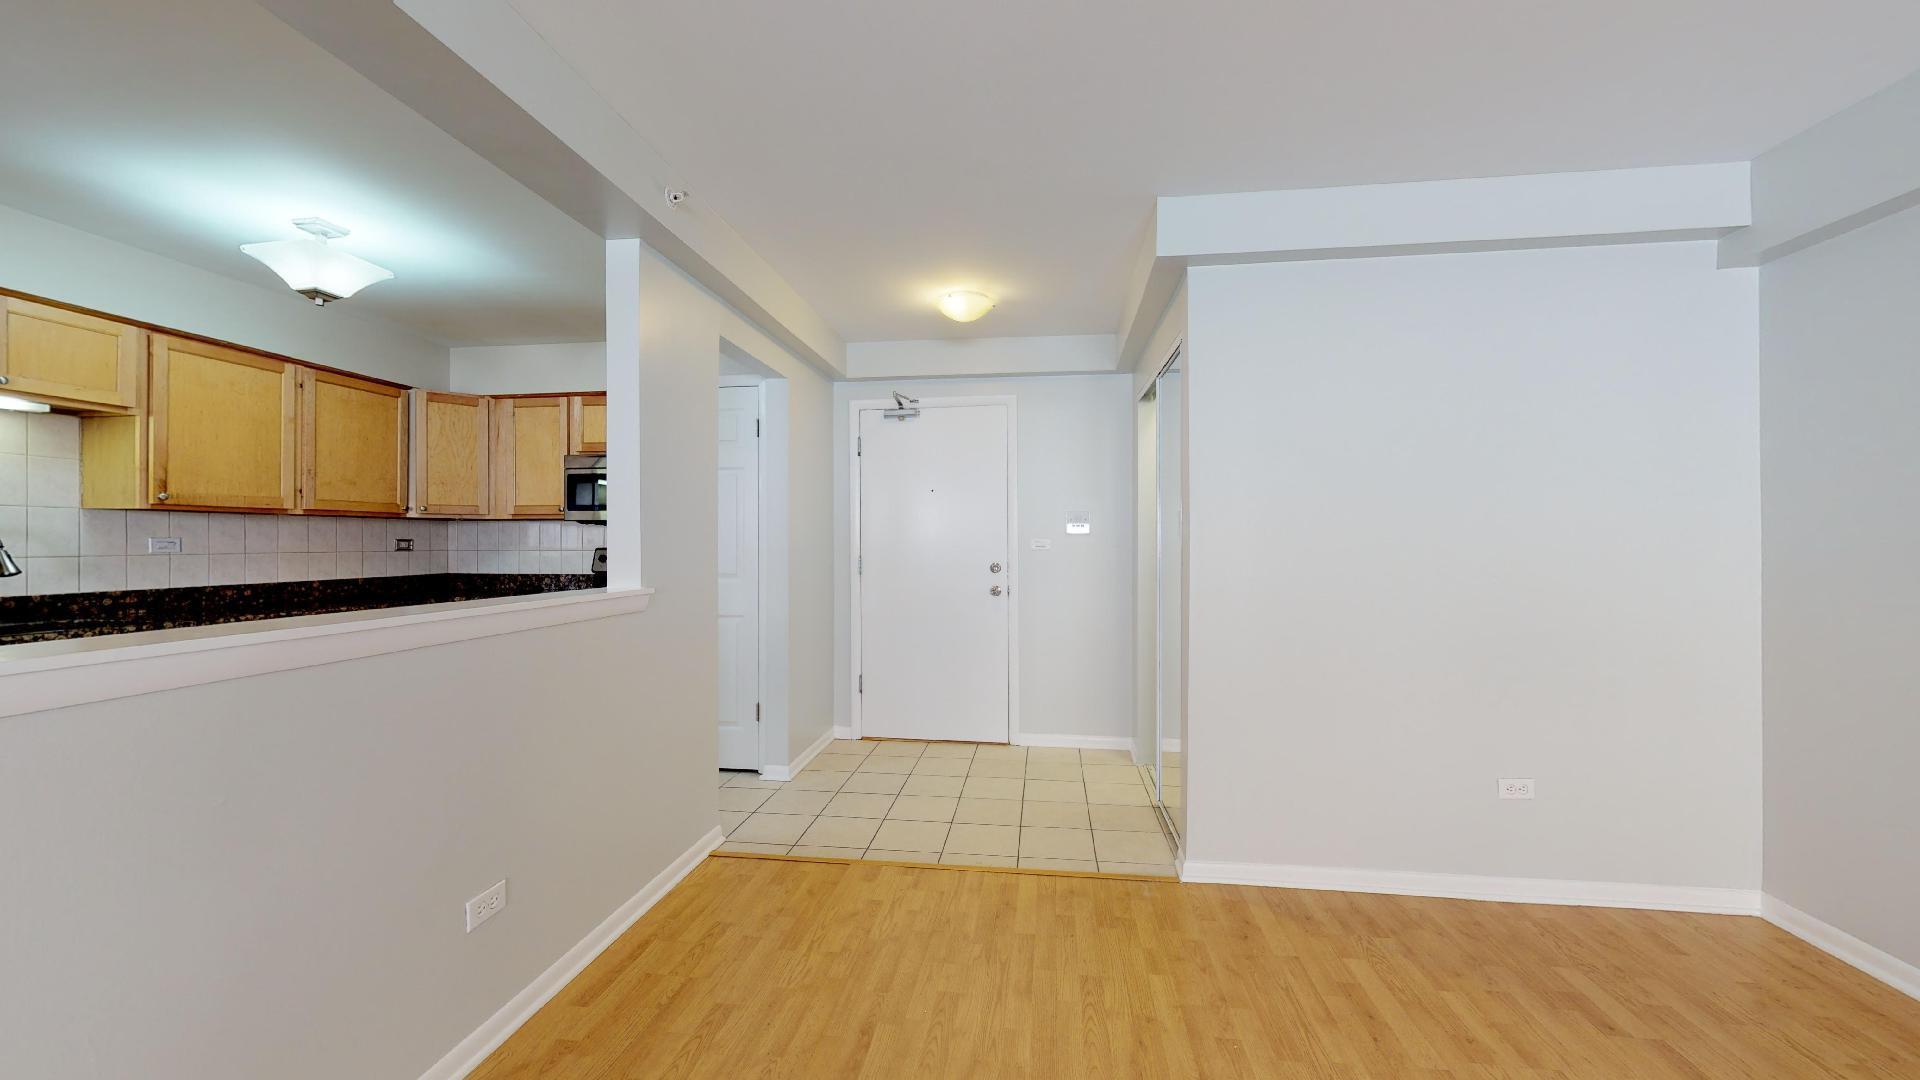 9445 Kenton  Avenue, Unit 102 photo